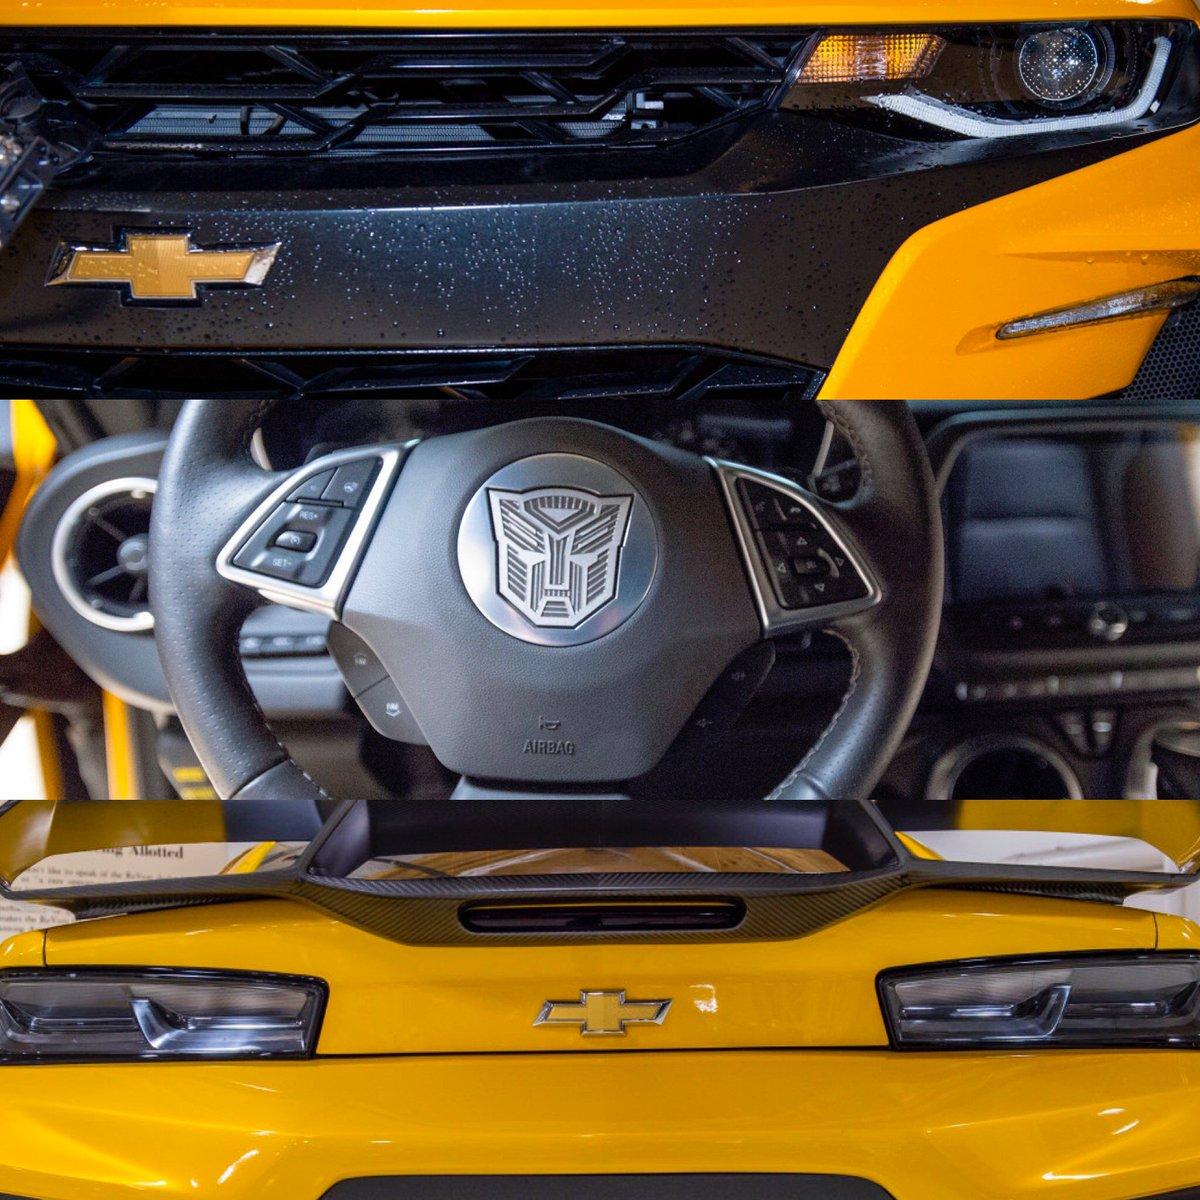 TLK Bumblebee Camaro To Be Featured On Jay Leno's Garage